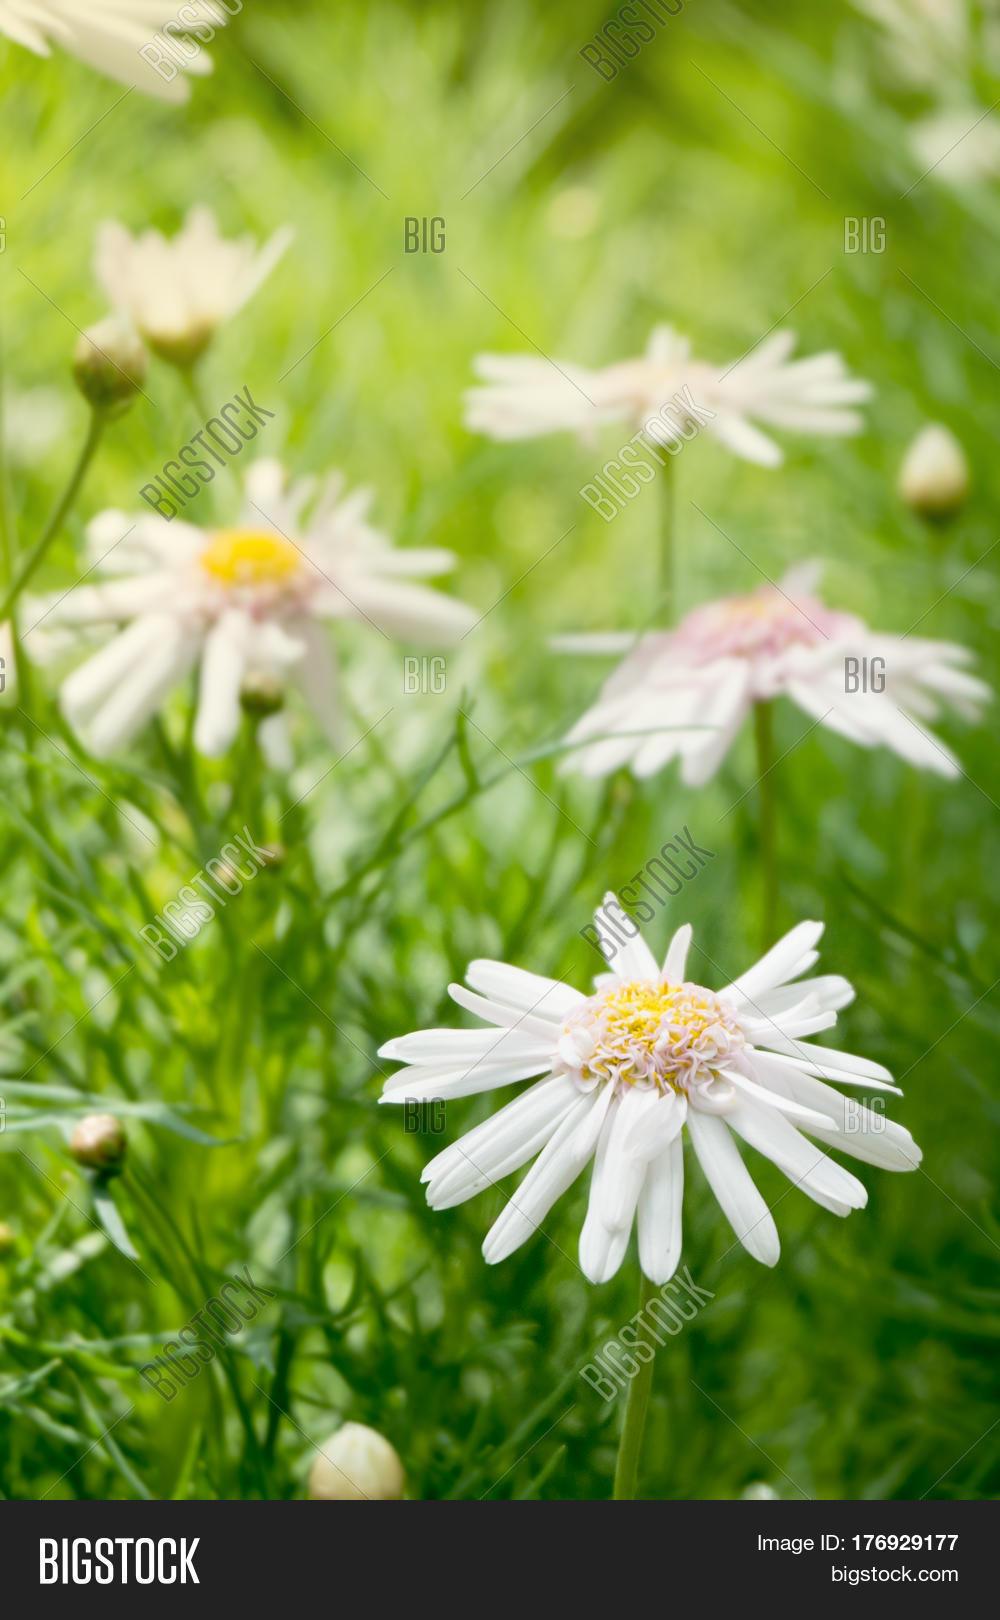 Beautiful White Daisy Image Photo Free Trial Bigstock